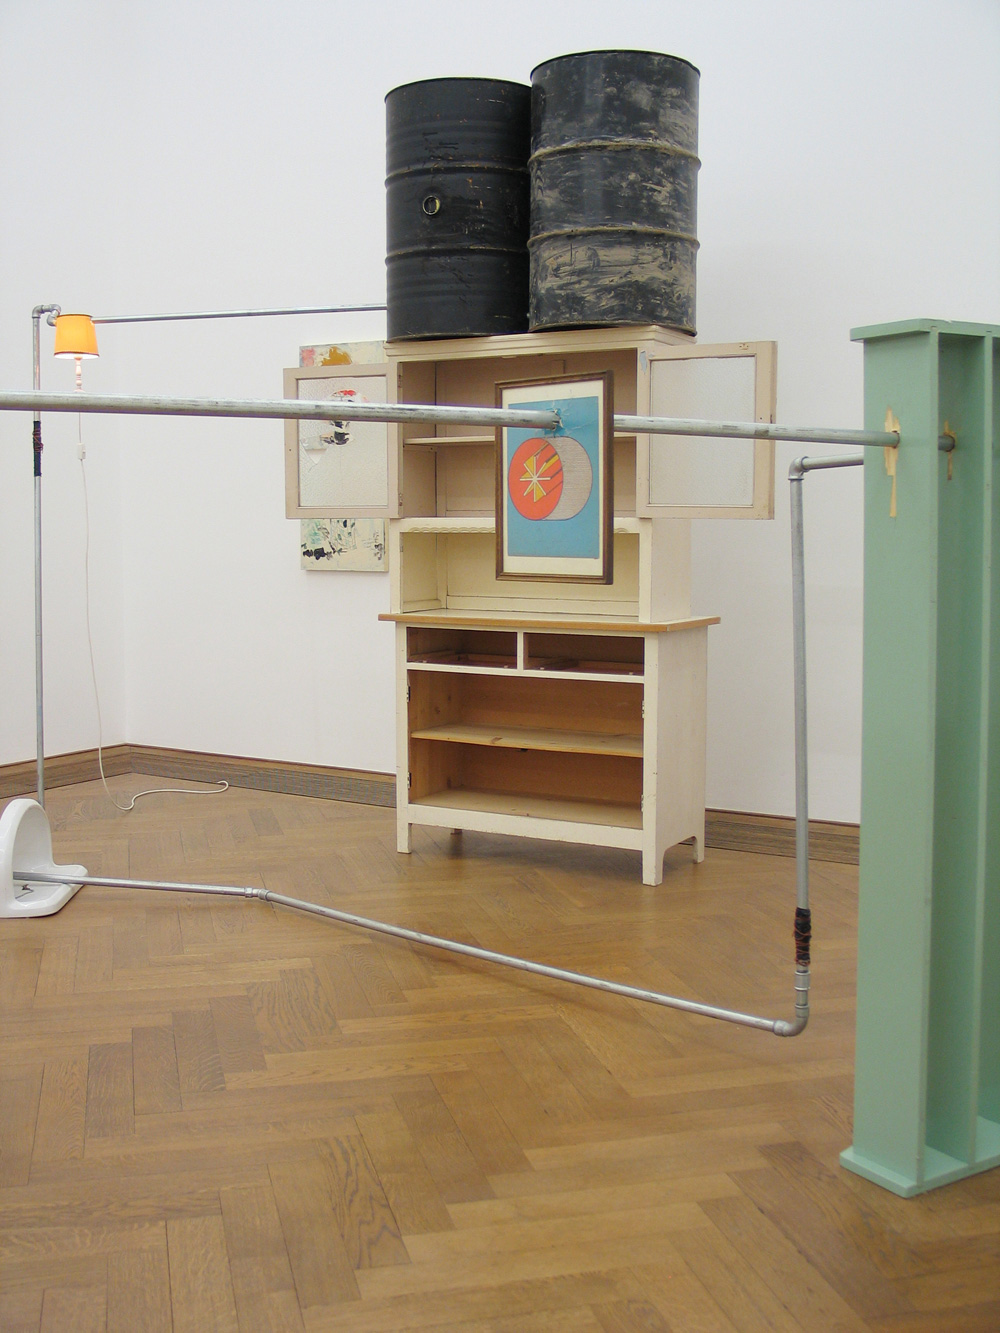 Galerie Barbara Thumm \ Diango Hernández – Revolution – Kunsthalle Basel, Switzerland